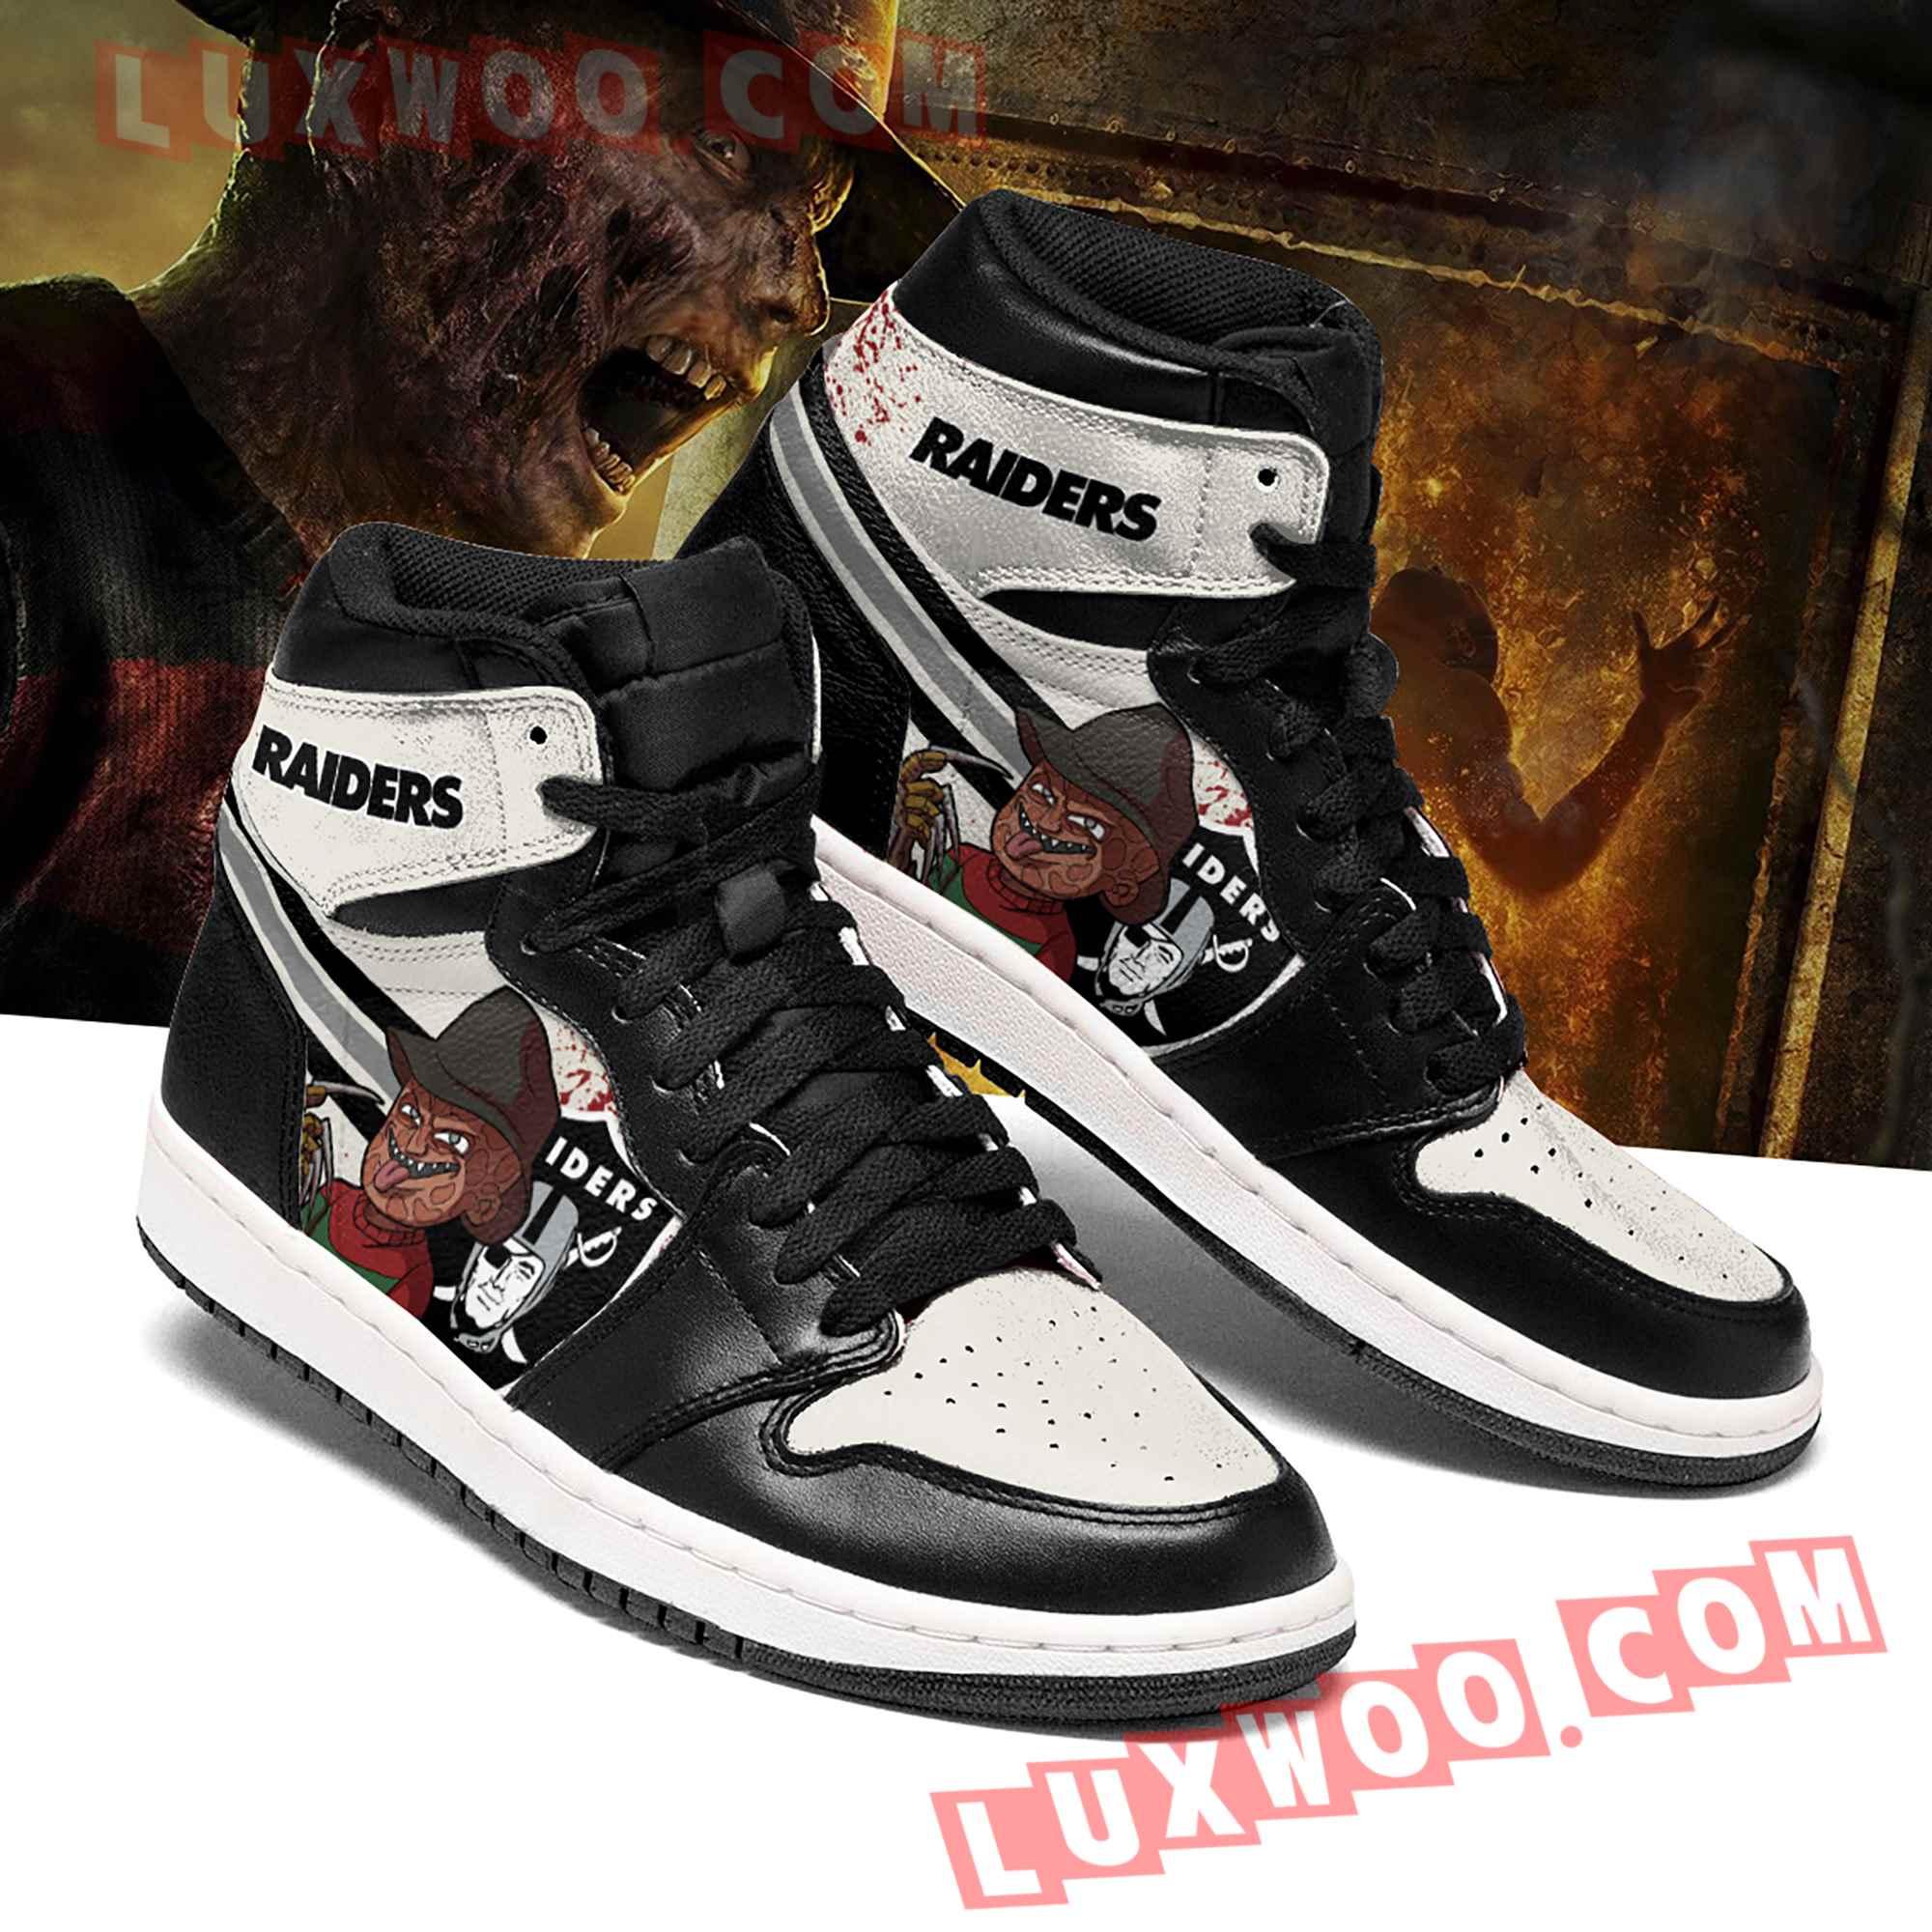 Oakland Raiders Nfl Air Jordan 1 Custom Shoes Sneaker V1